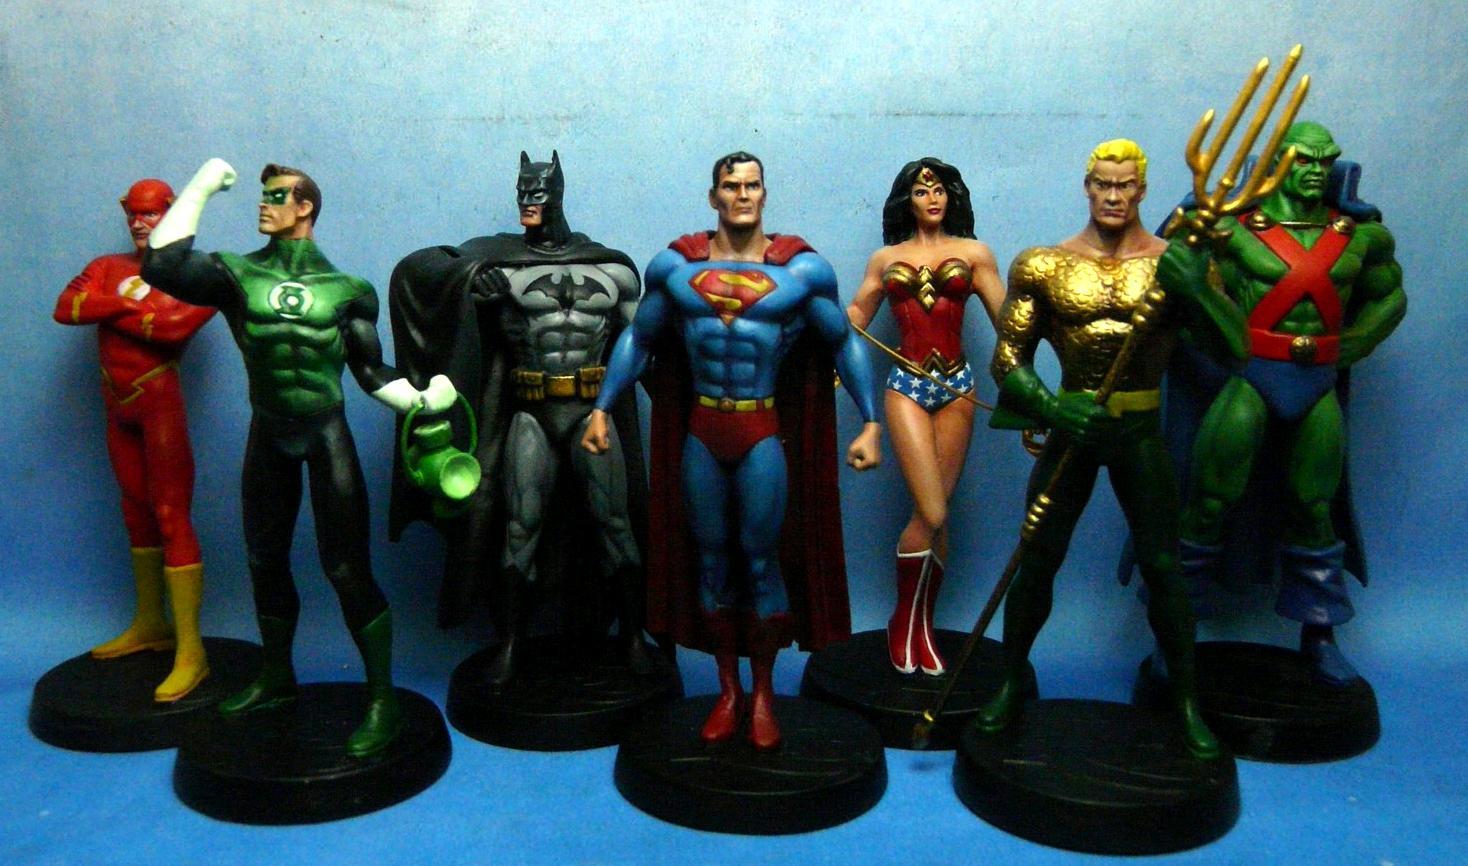 Aquaman, Batman, Comics, Dc, Green Lantern, Jla, Justice League Of America, Martian Manhunter, Superhero, Superman, Wonder Woman